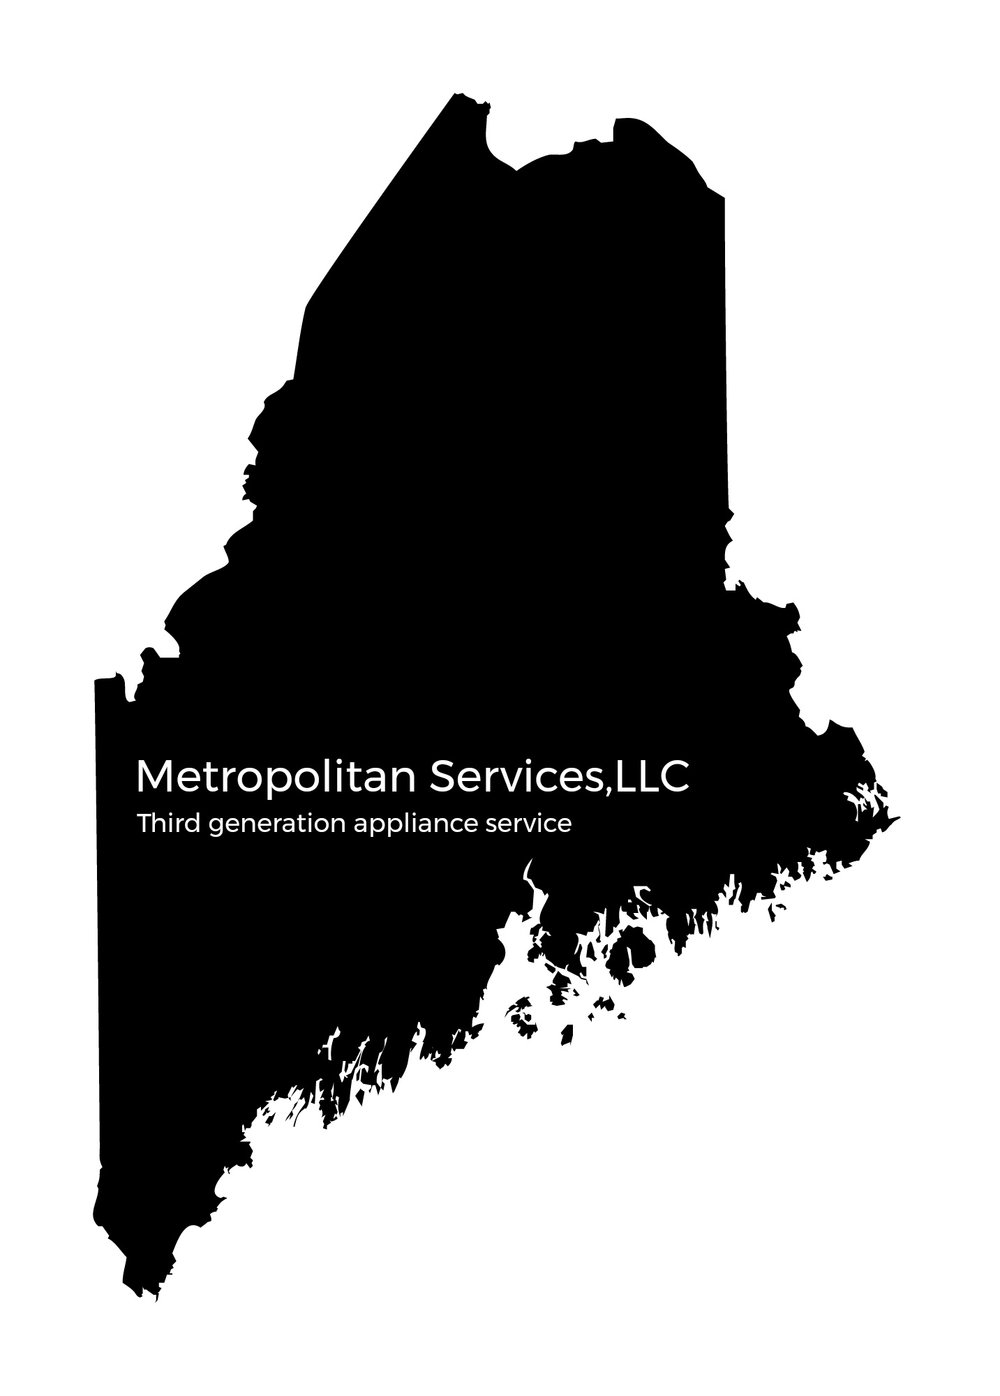 Metropolitan+Services%2CLLC-logo-black.jpg